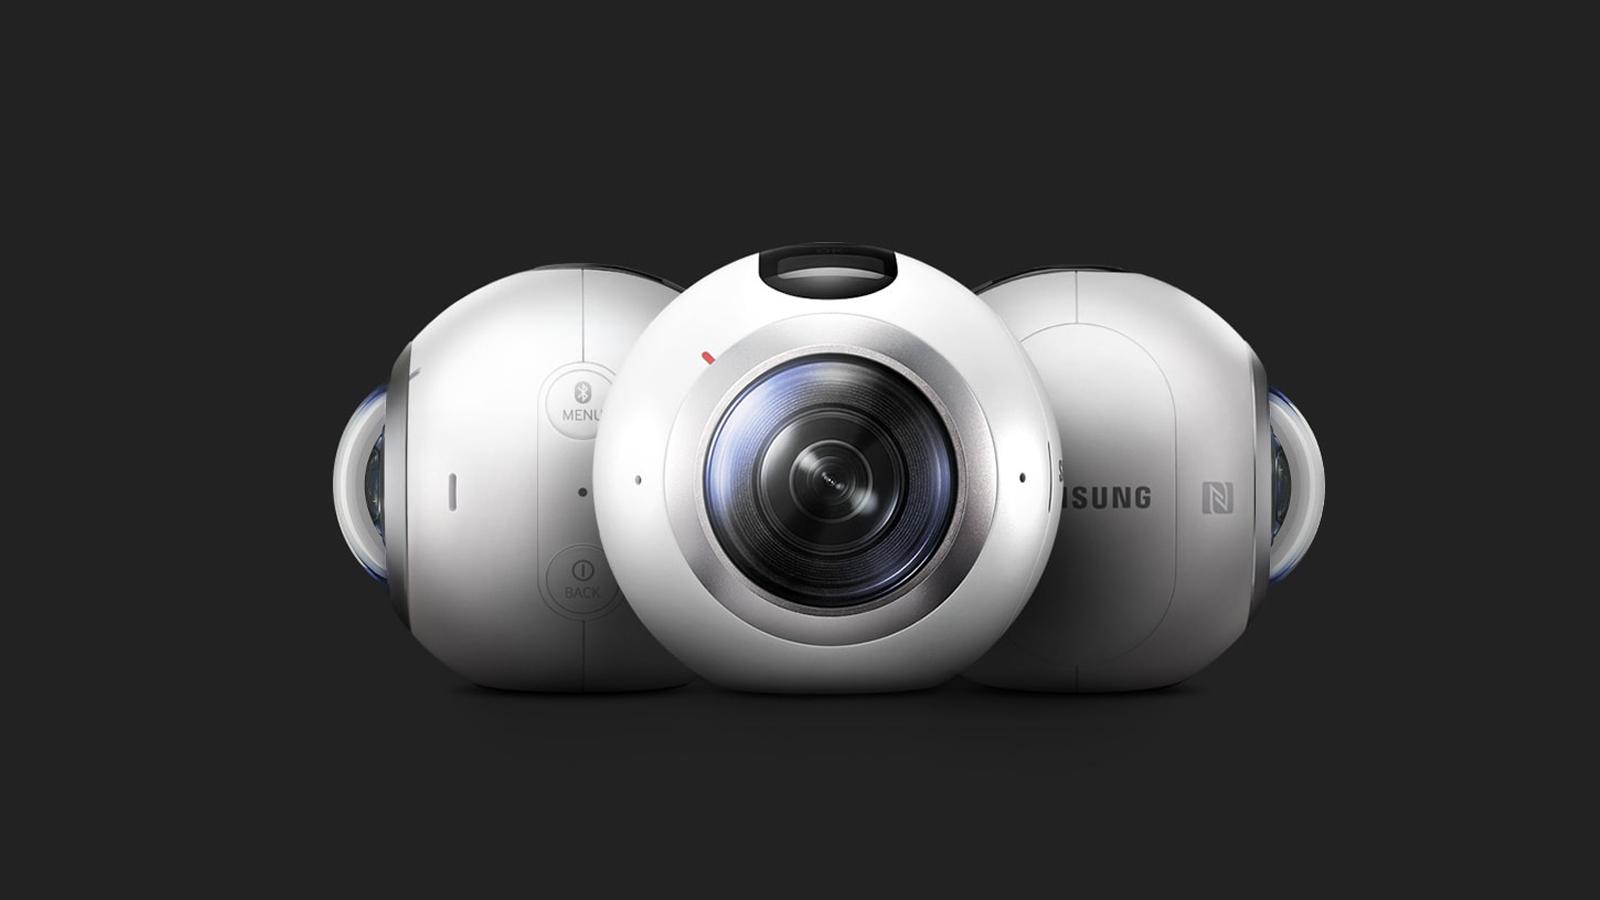 Samsung Gear inova com vídeos a 360°